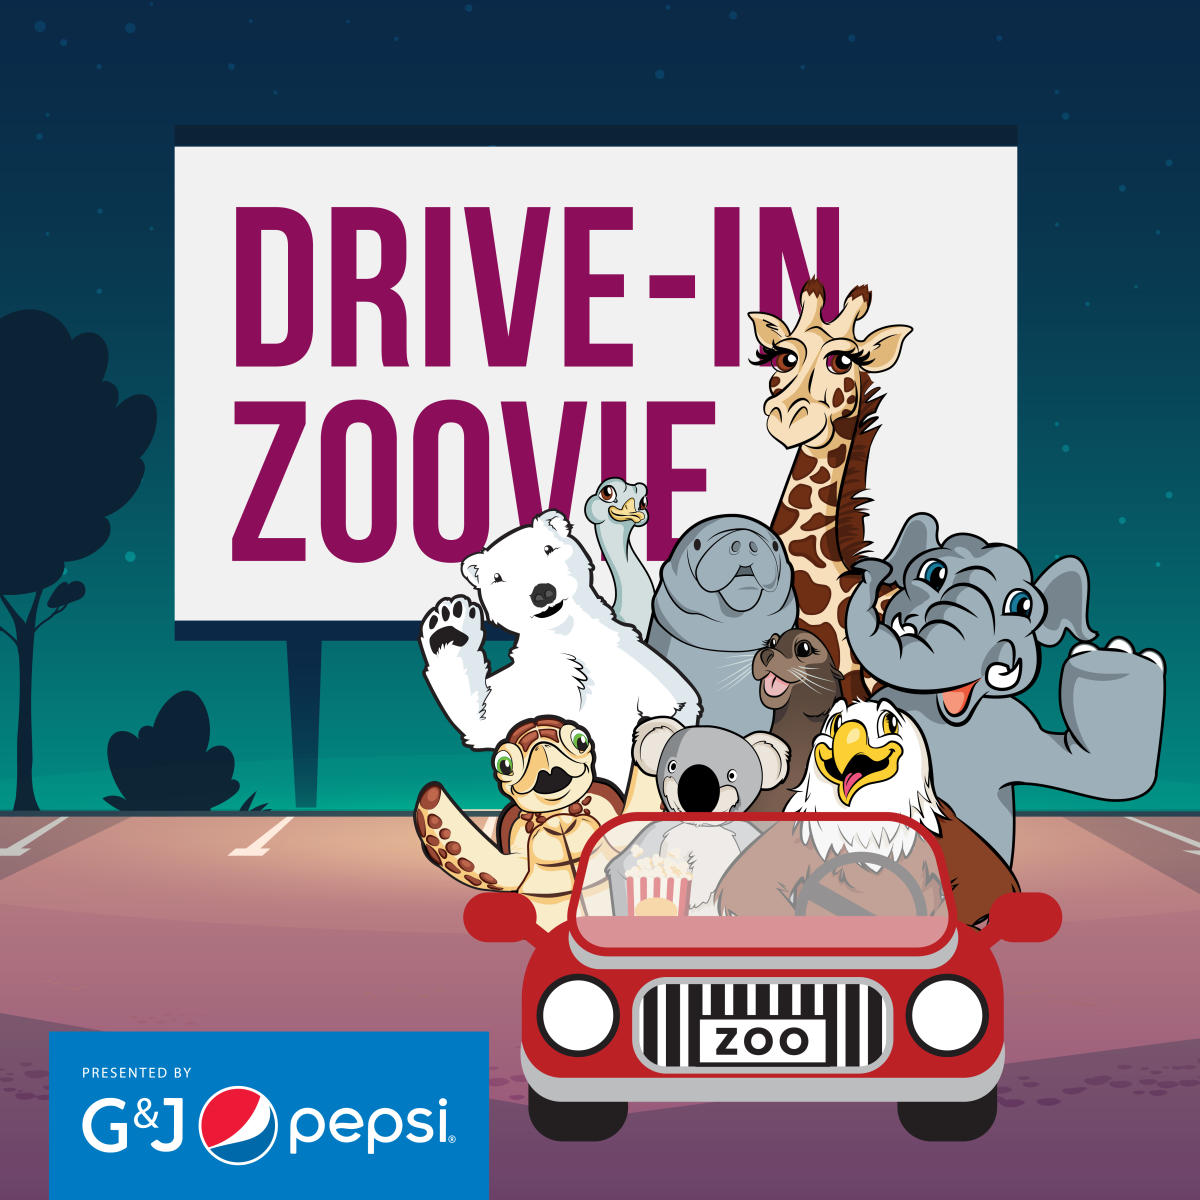 Columbus Zoo Drive-in Zoovie Graphic